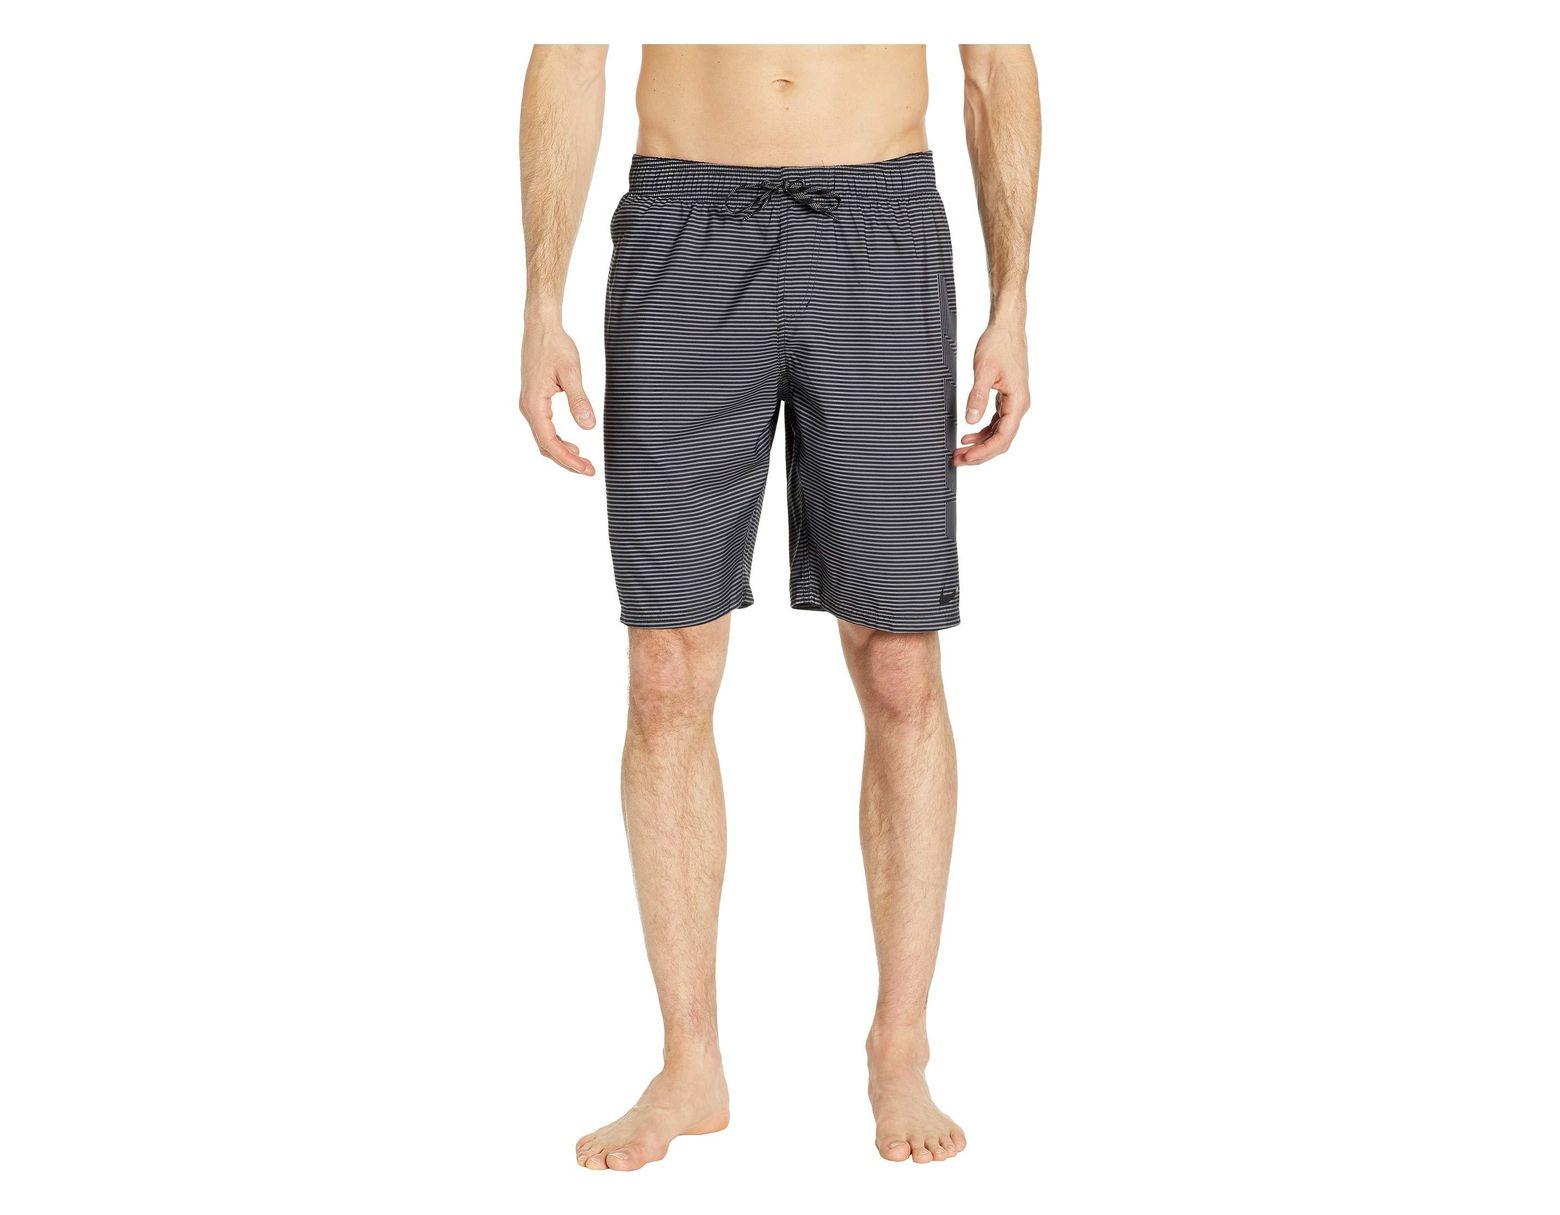 31322e2b076e9 Nike 9 Line Break Breaker Volley Shorts in Black for Men - Lyst